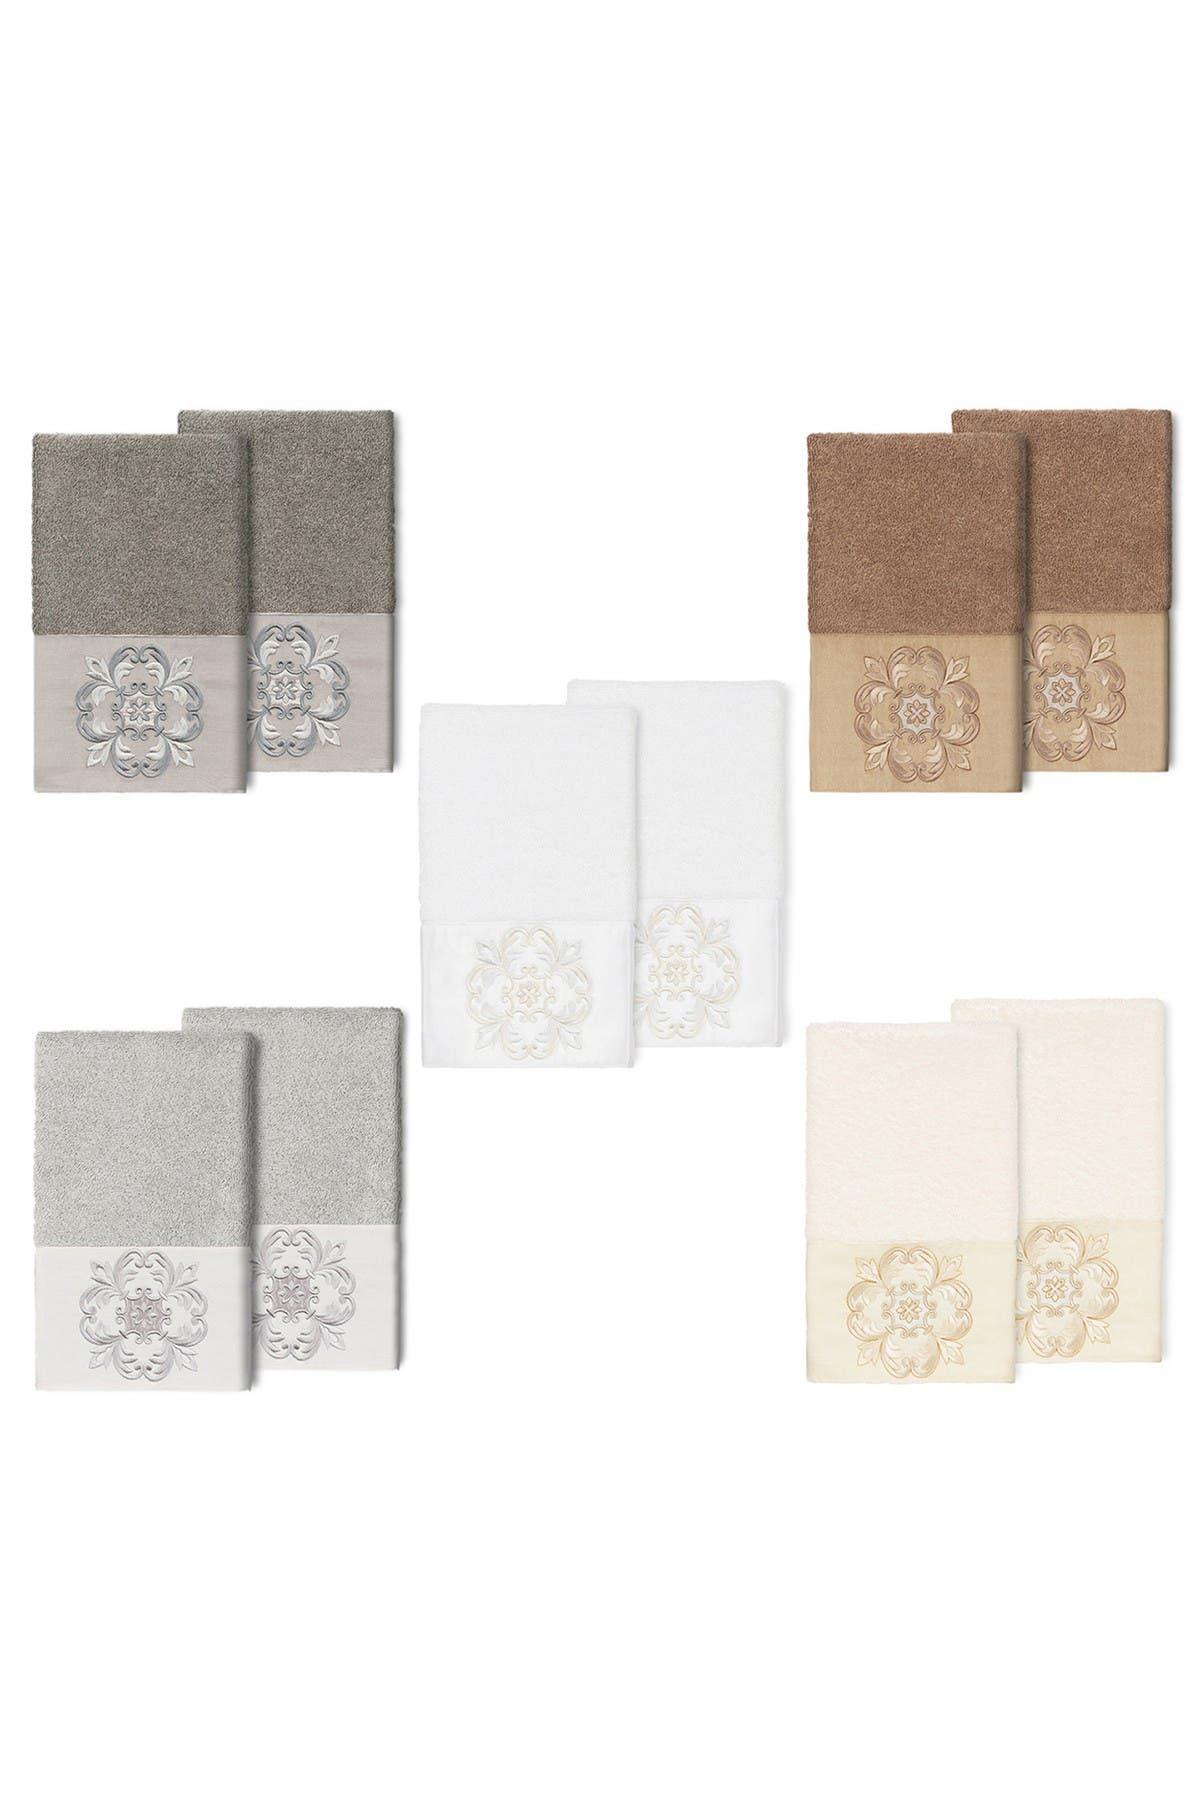 Image of LINUM HOME Alyssa Embellished Hand Towel - Set of 2 - White